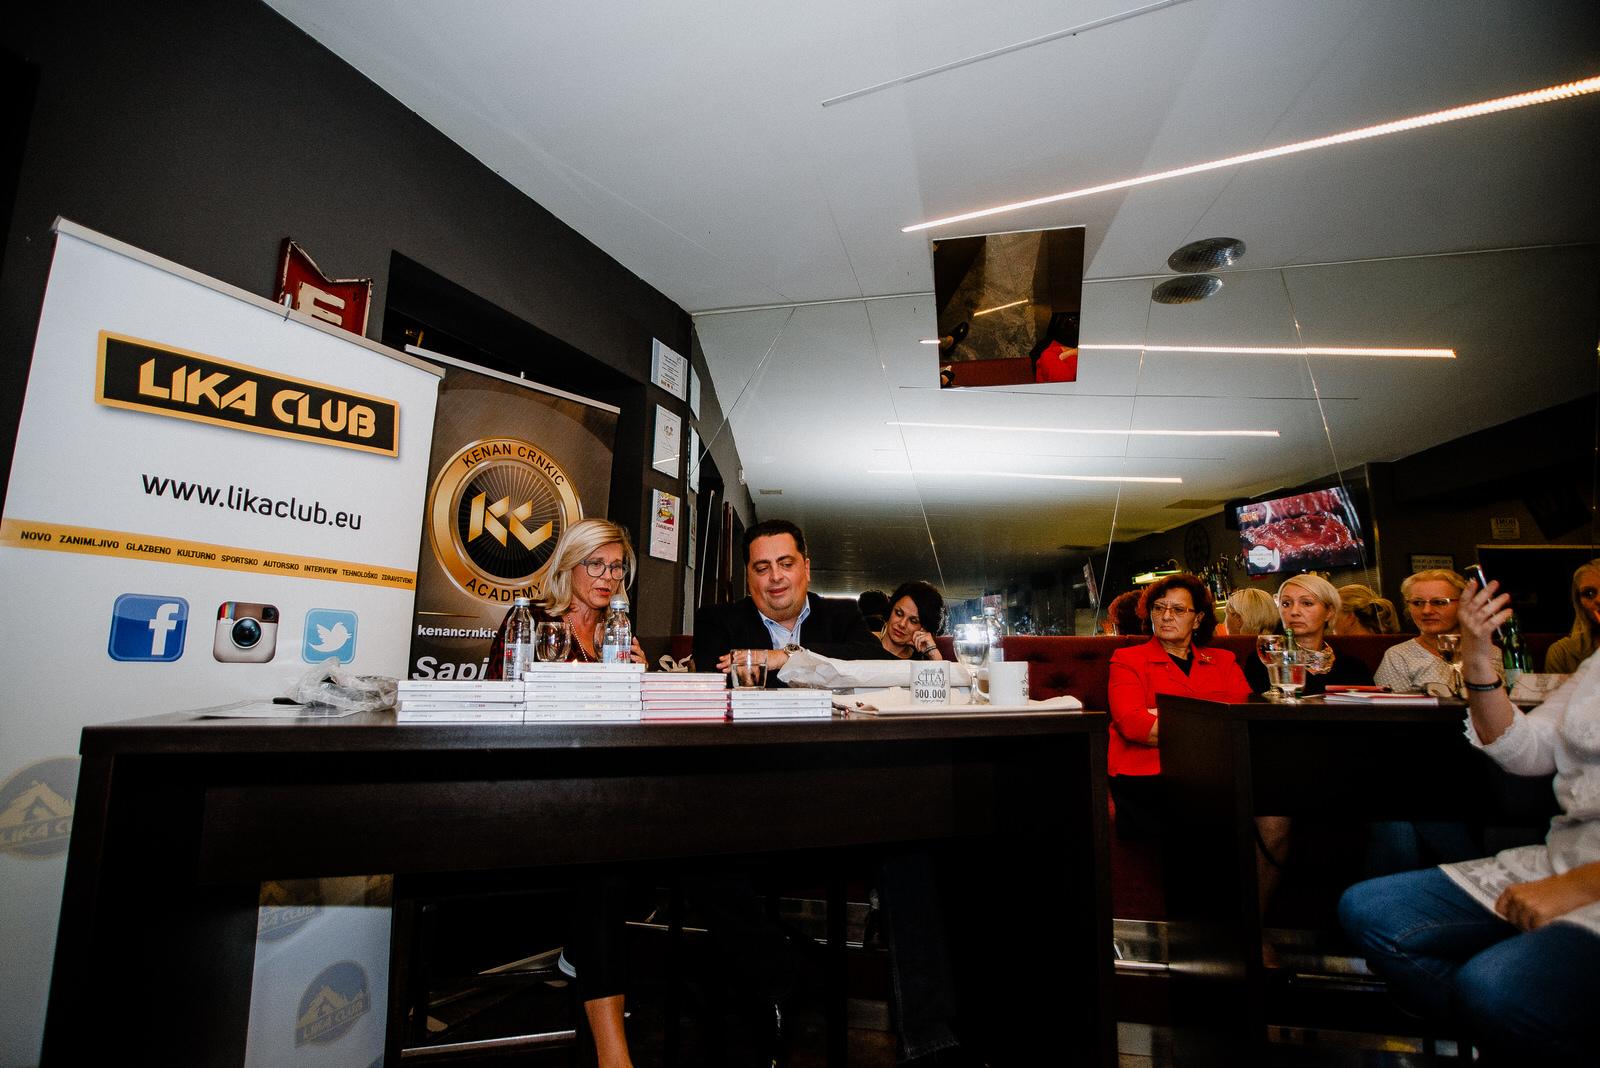 likaclub_otočac_book-caffe-paradisso_kenan-crnkić_2019-14